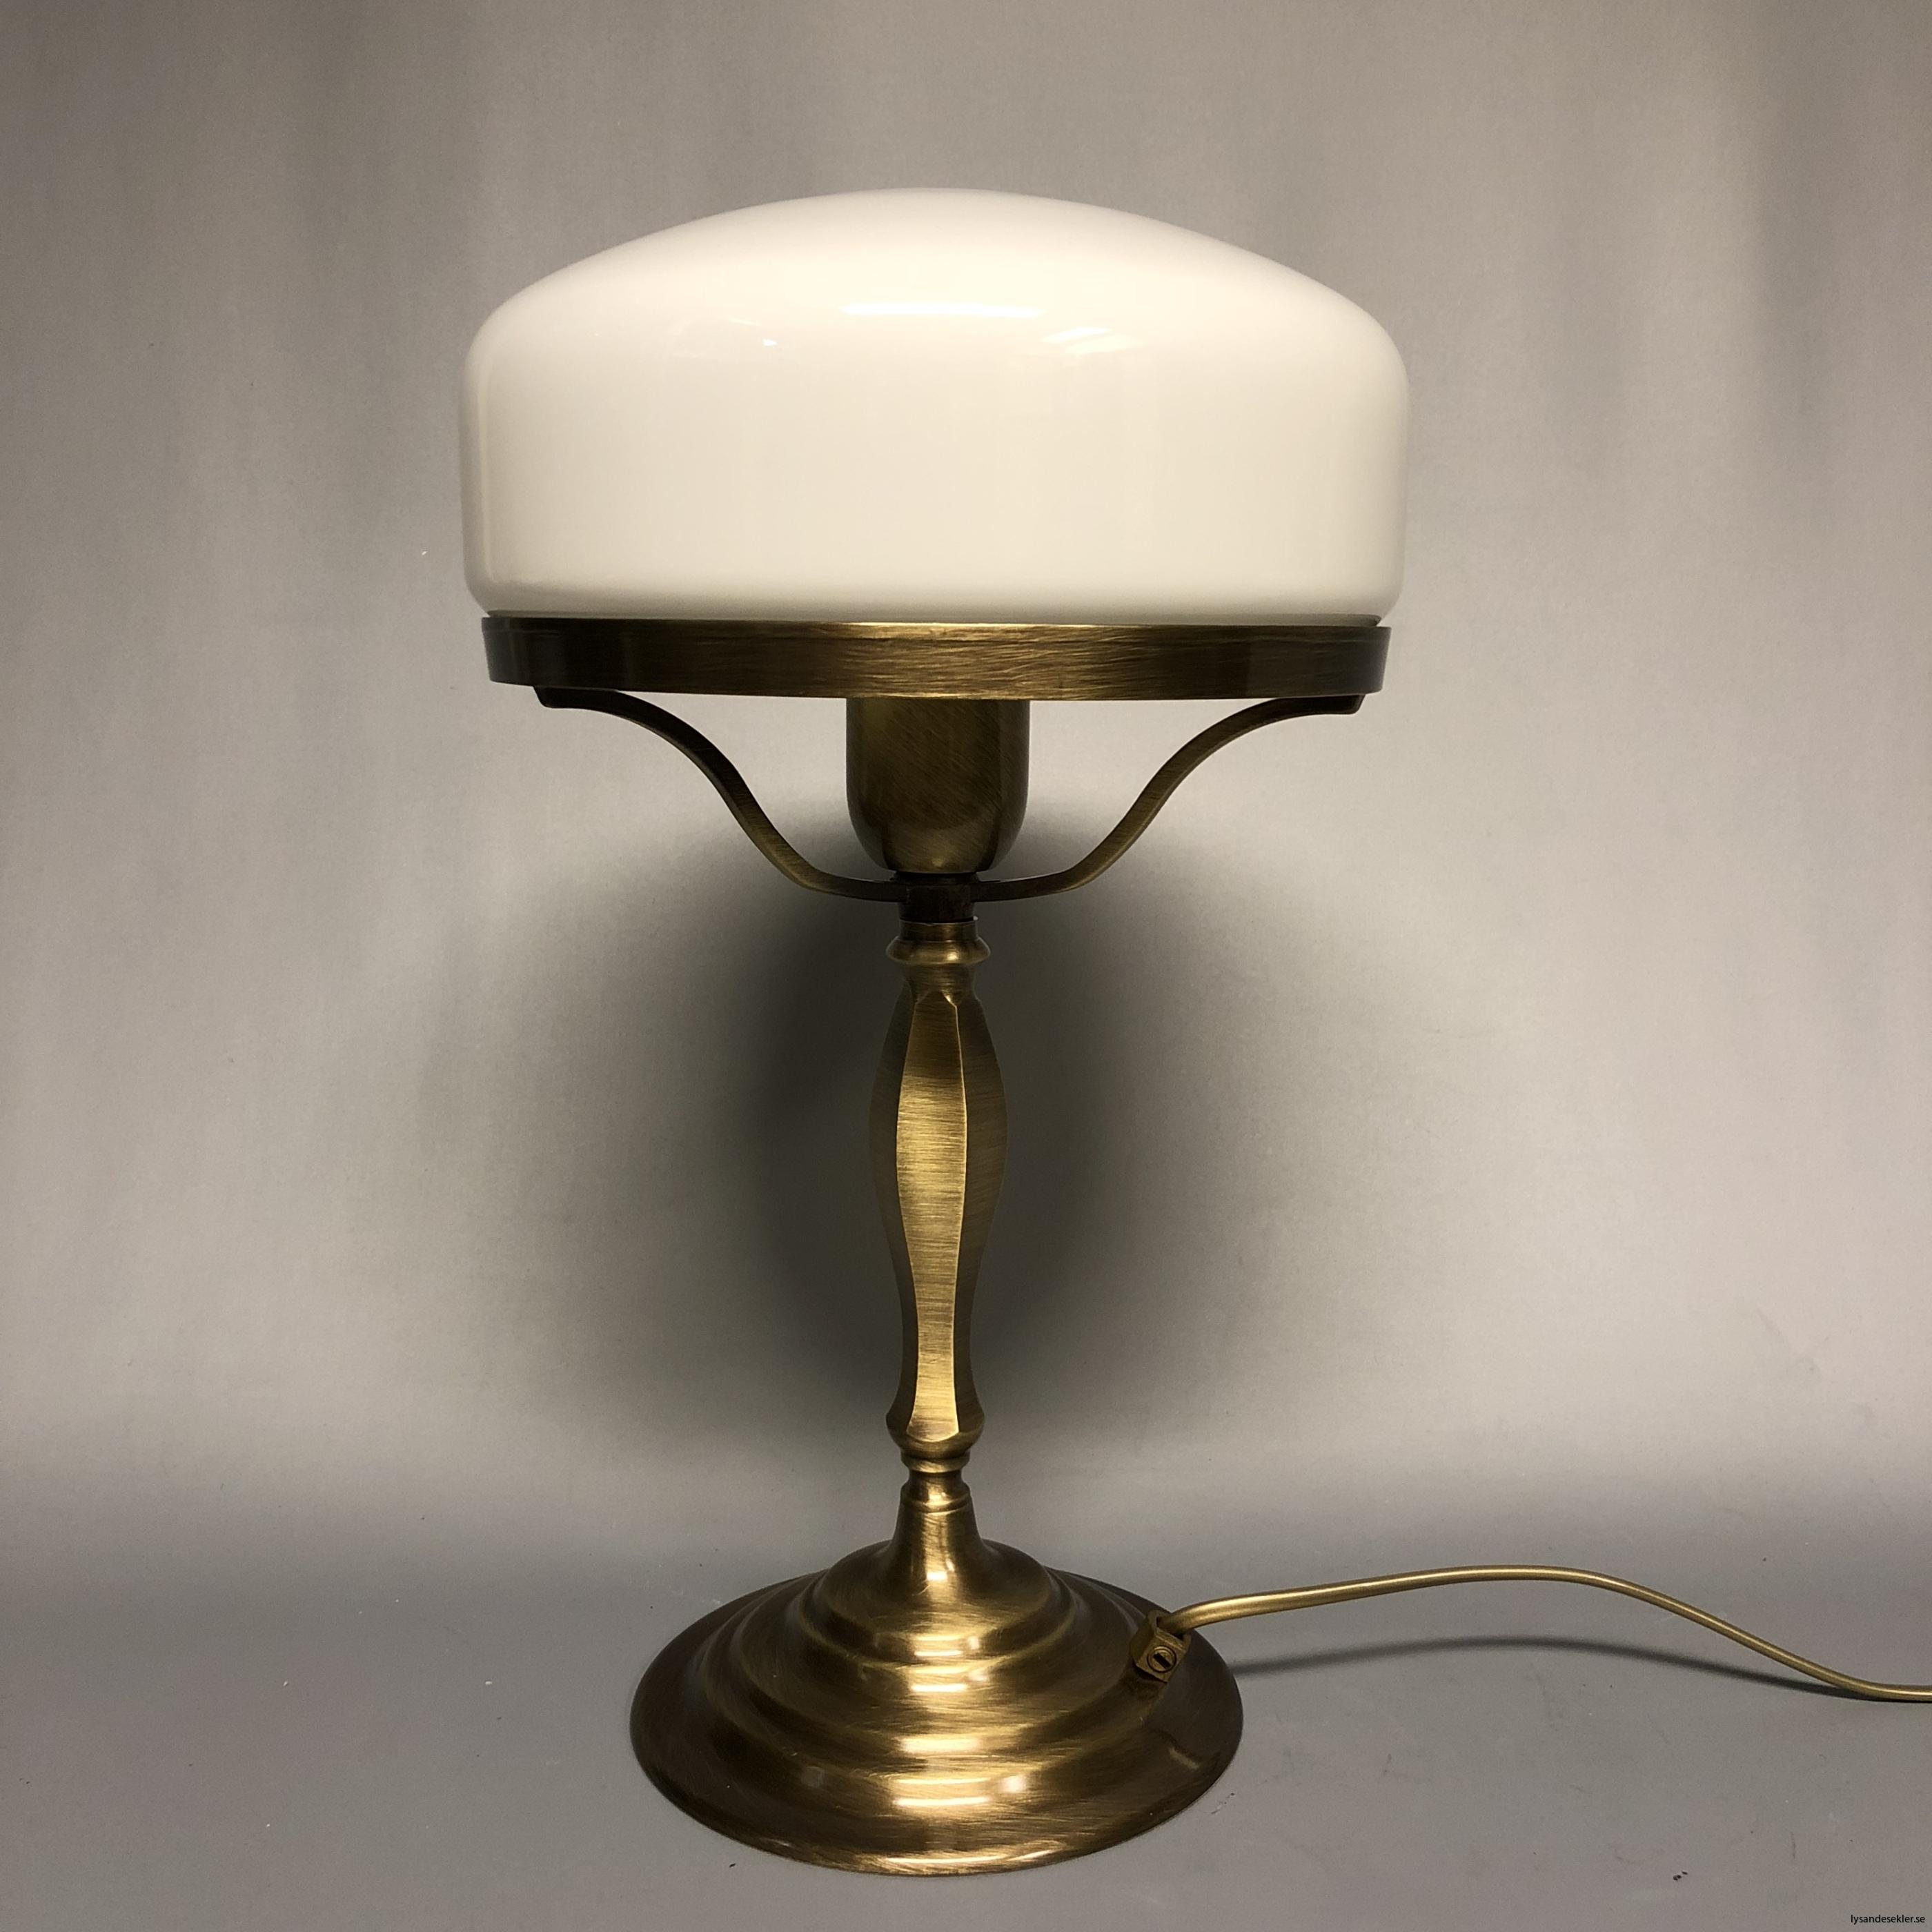 strindbergslampa strindbergslampor strindberg lampa skärm kupa strindbergsskärm strindbergskupa2